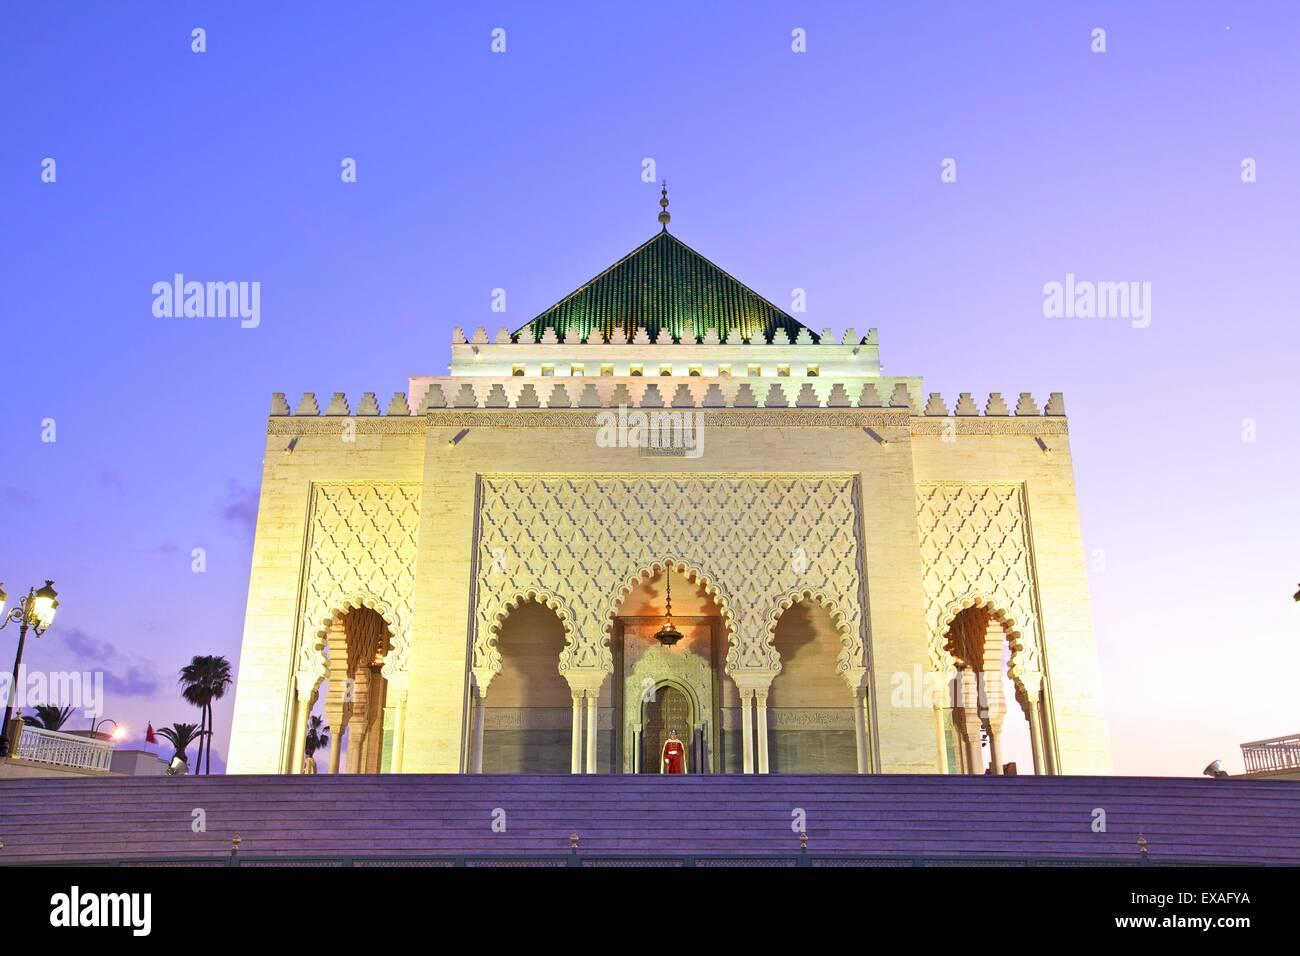 Mausoleum of Mohammed V at dusk, Rabat, Morocco, North Africa, Africa - Stock Image